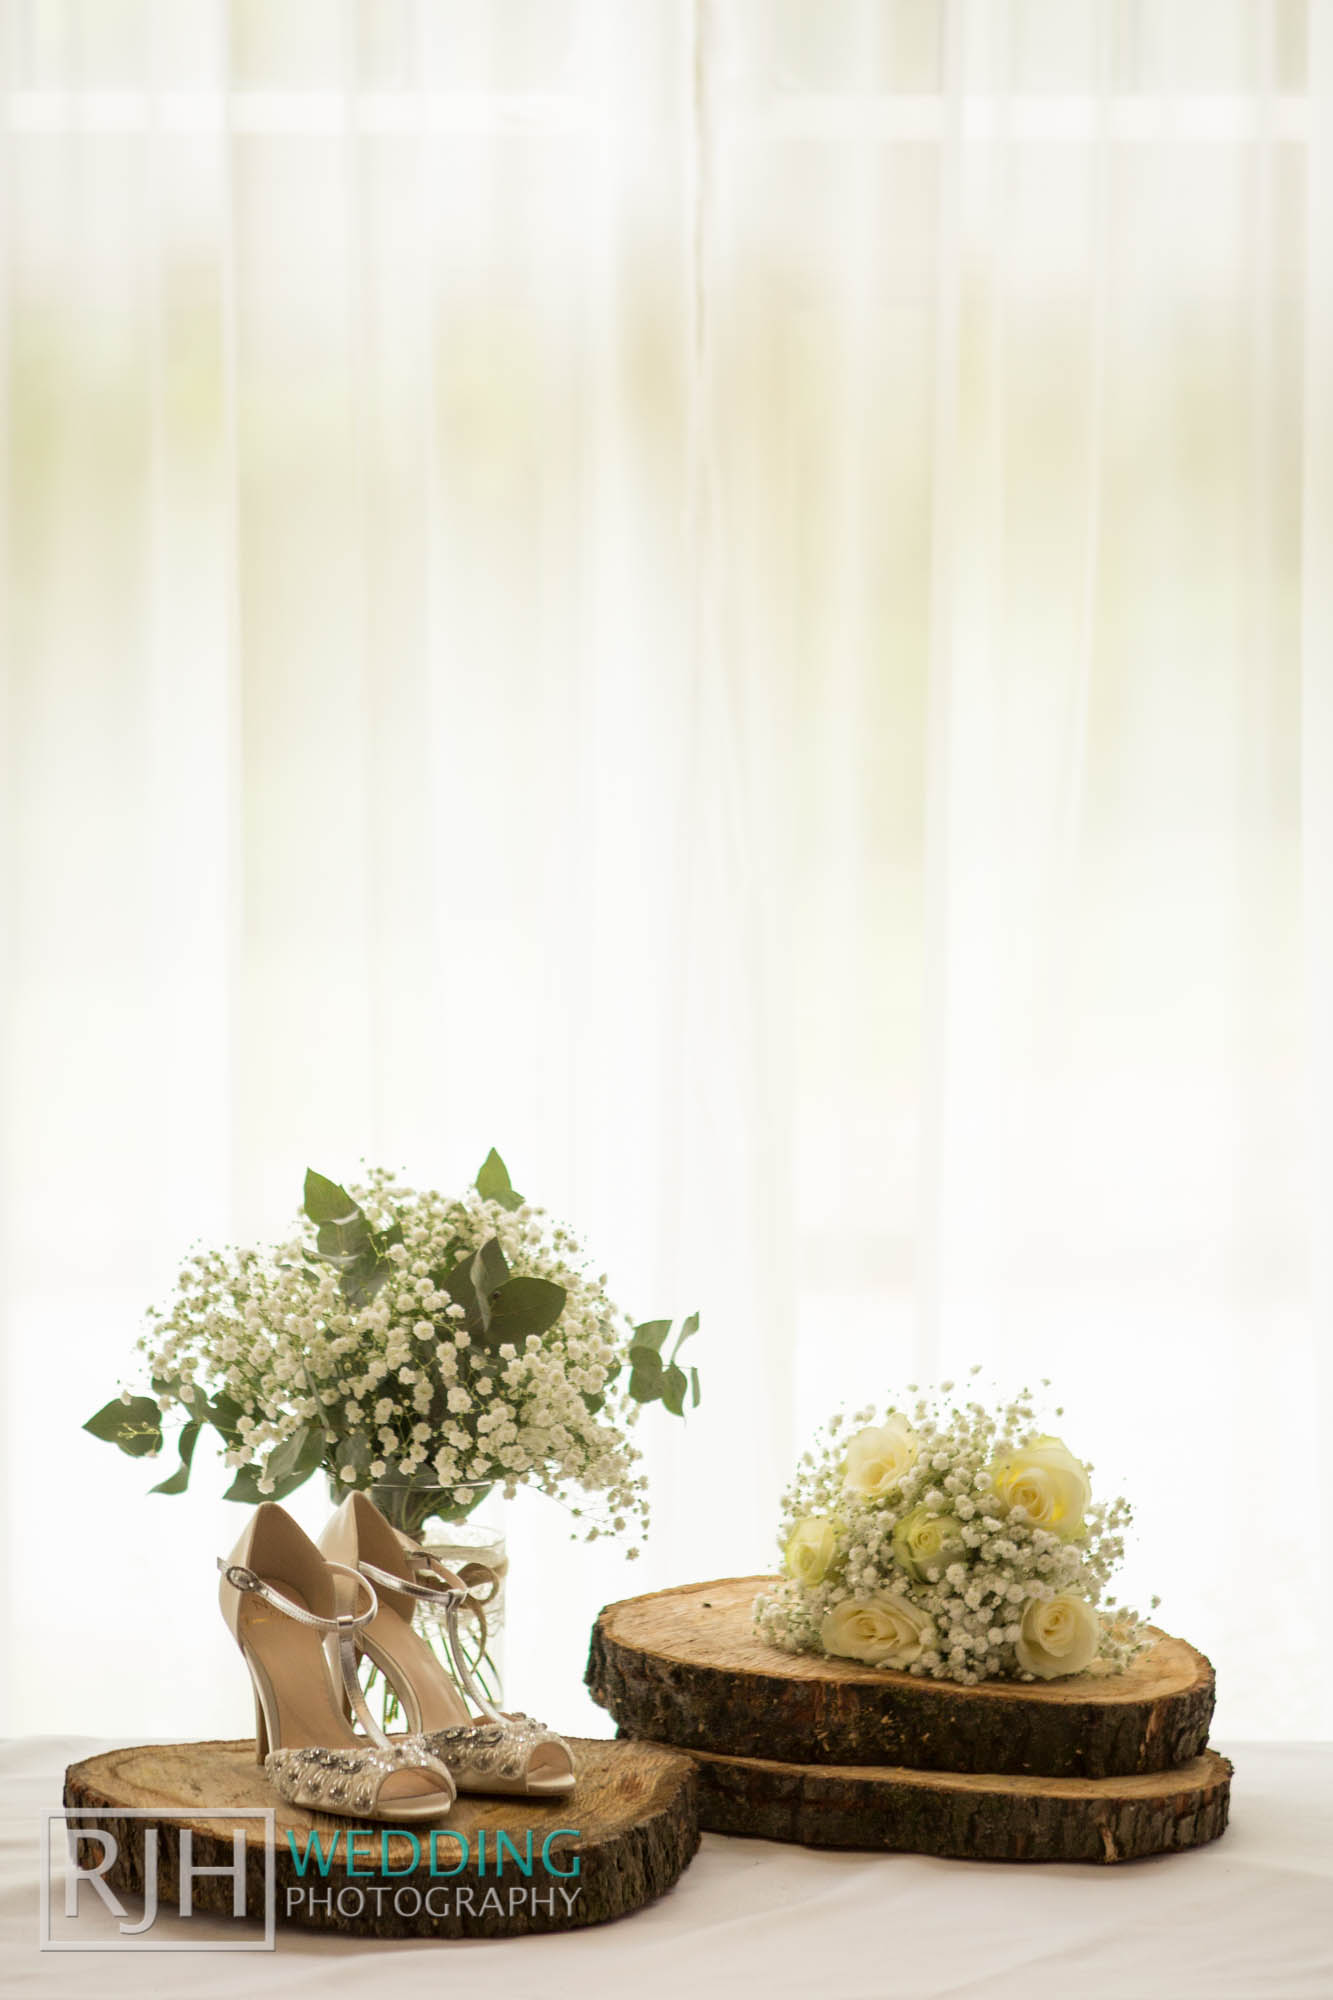 Whitley Hall Marples Wedding_4_3C2A8365.jpg